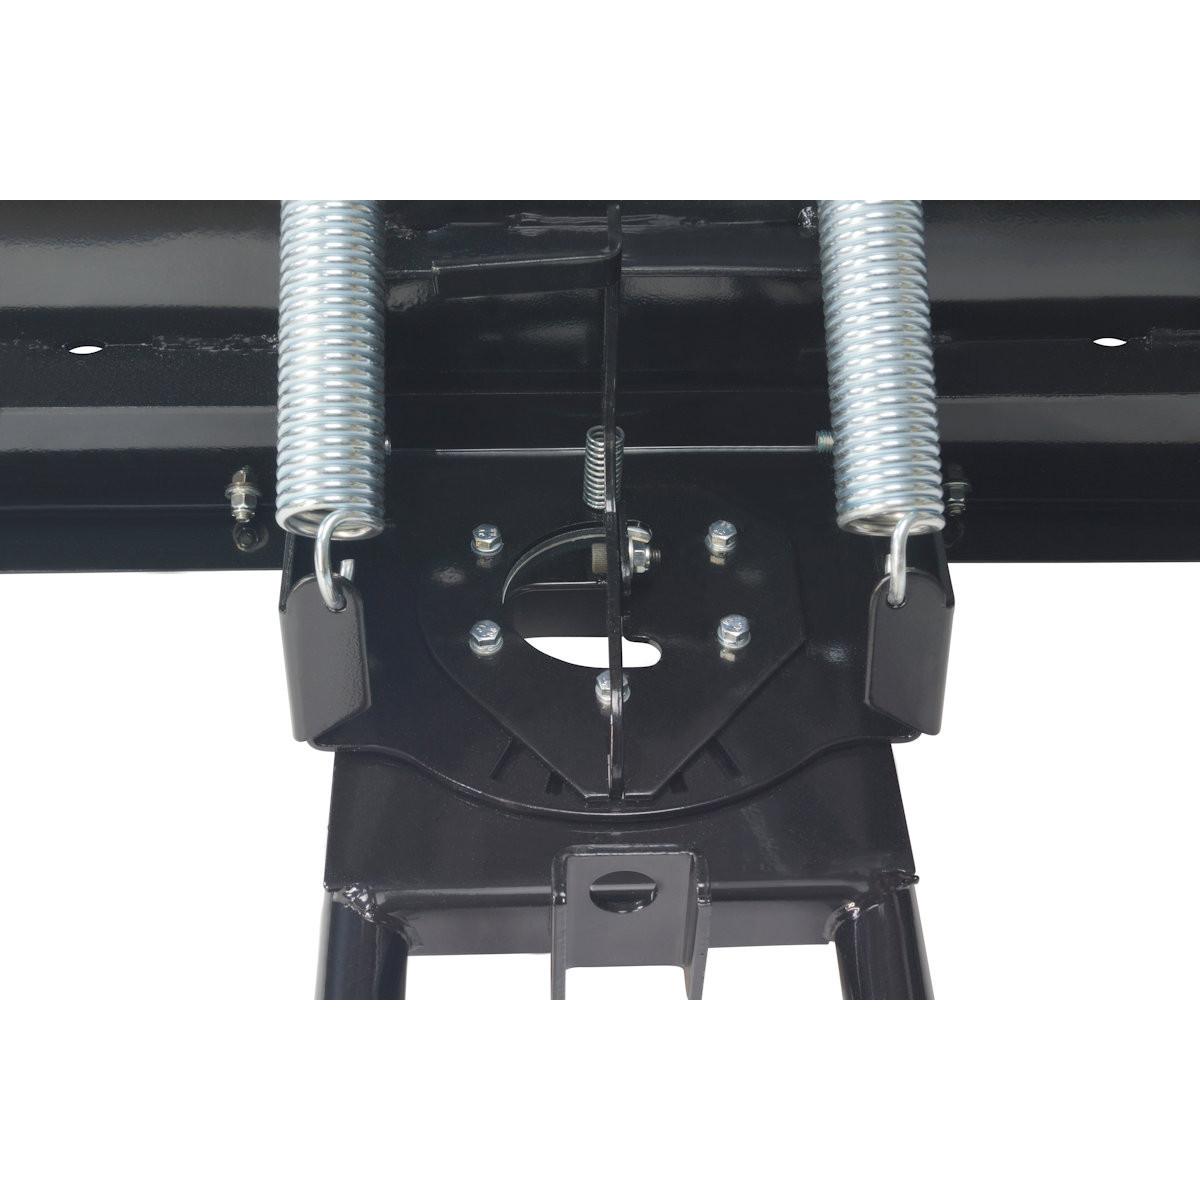 60 inch DENALI ATV Universal Snow Plow Kit